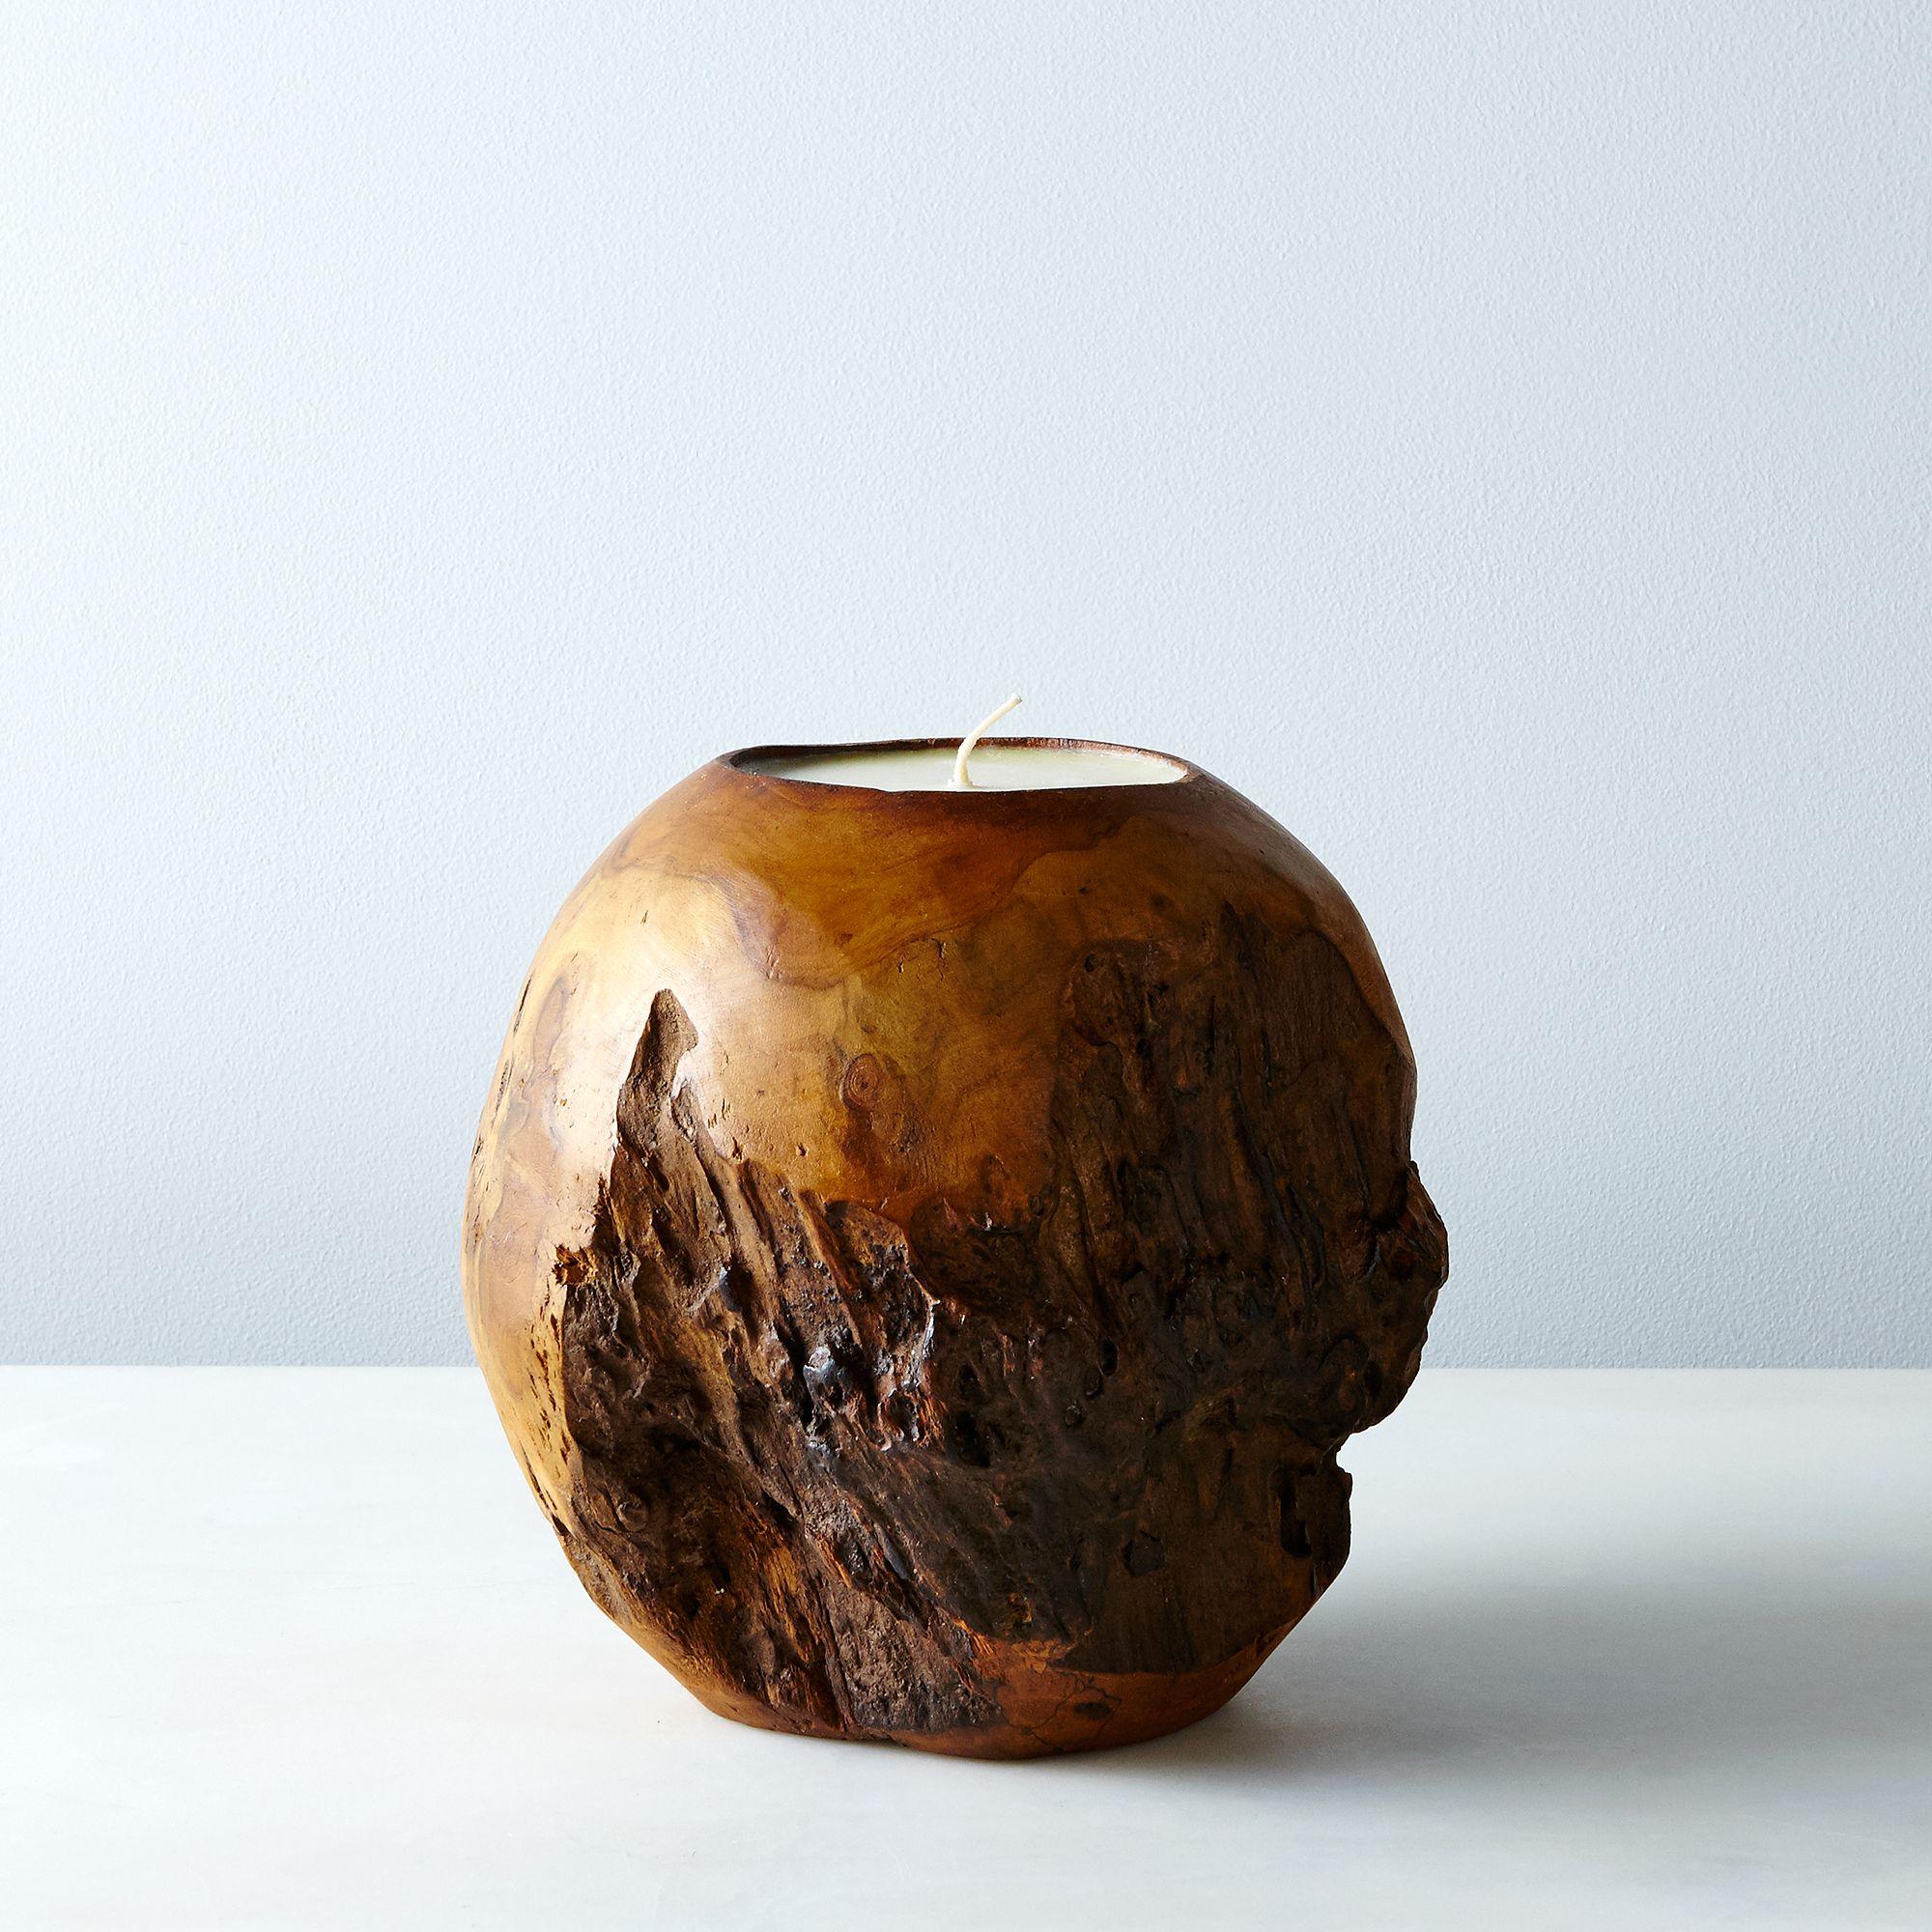 3f7b39a6 165c 45da af29 e2976a31ca23  2015 0605 volcanica sphere teak beeswax candle silo rocky luten 003